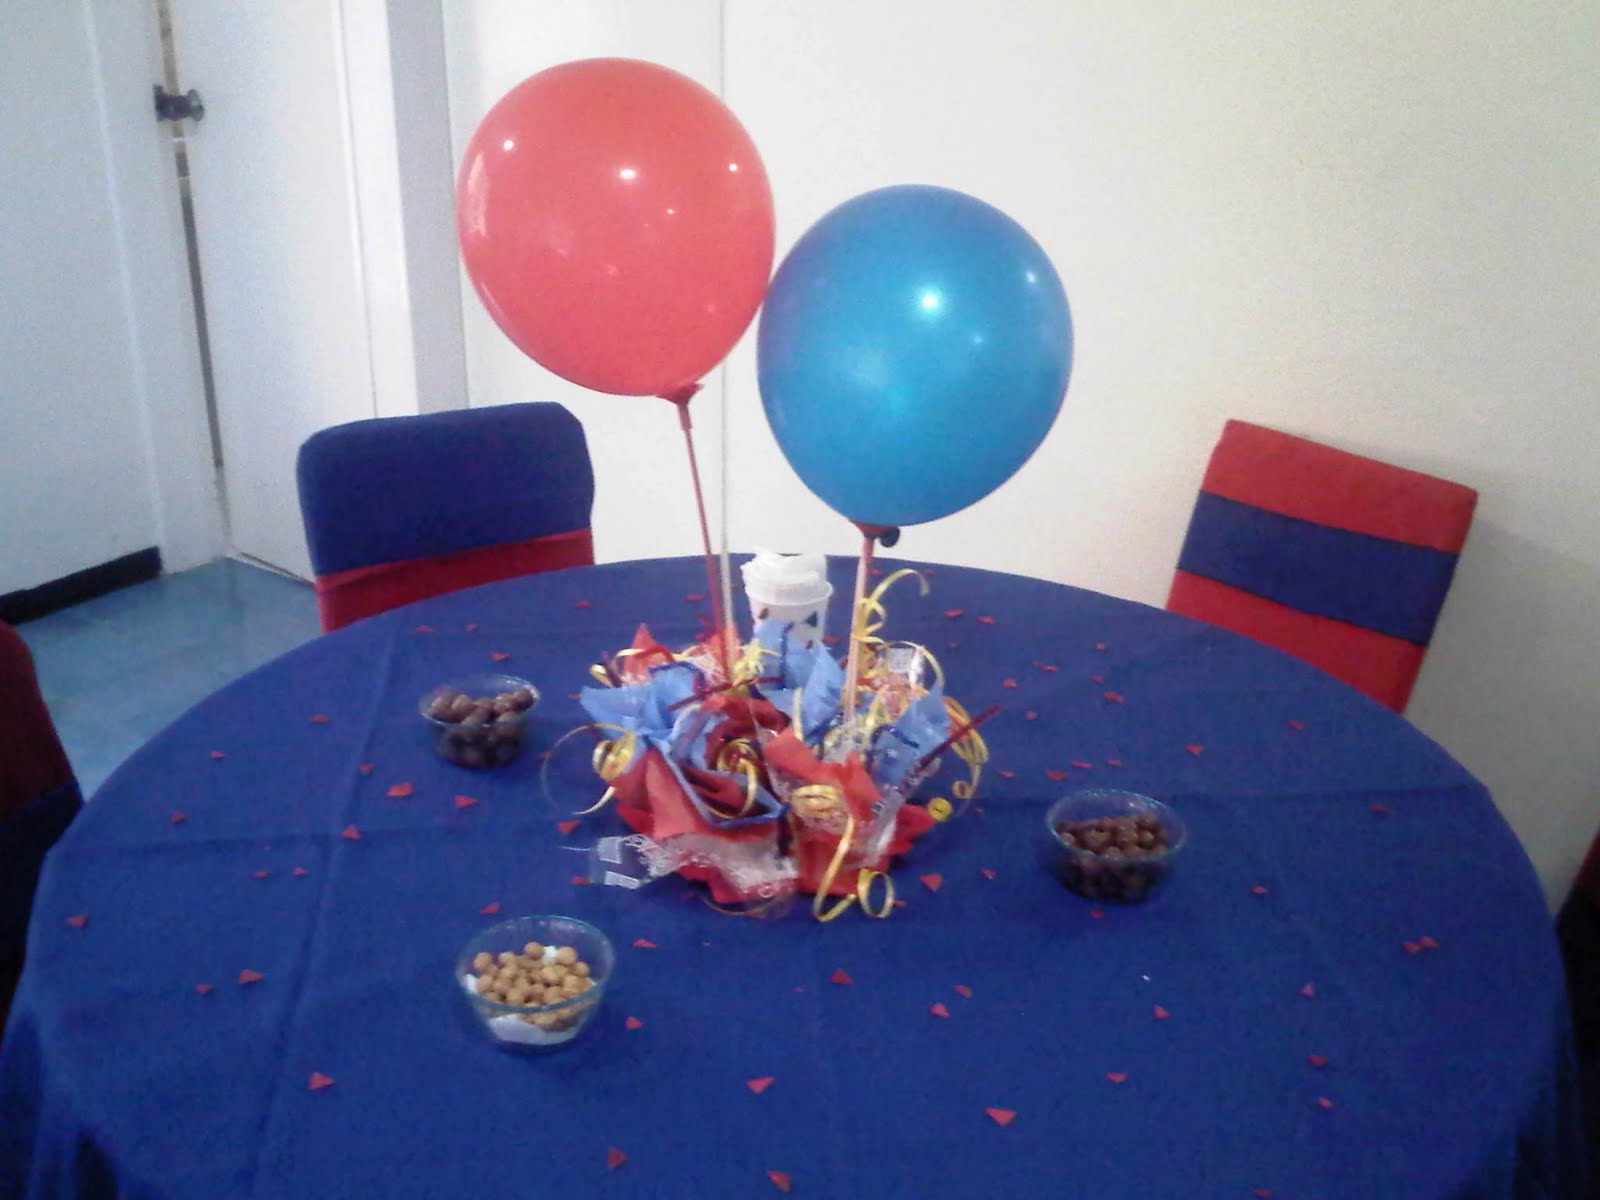 Evento fiesta infantil servicio decoracion de salon - Centros mesa salon ...